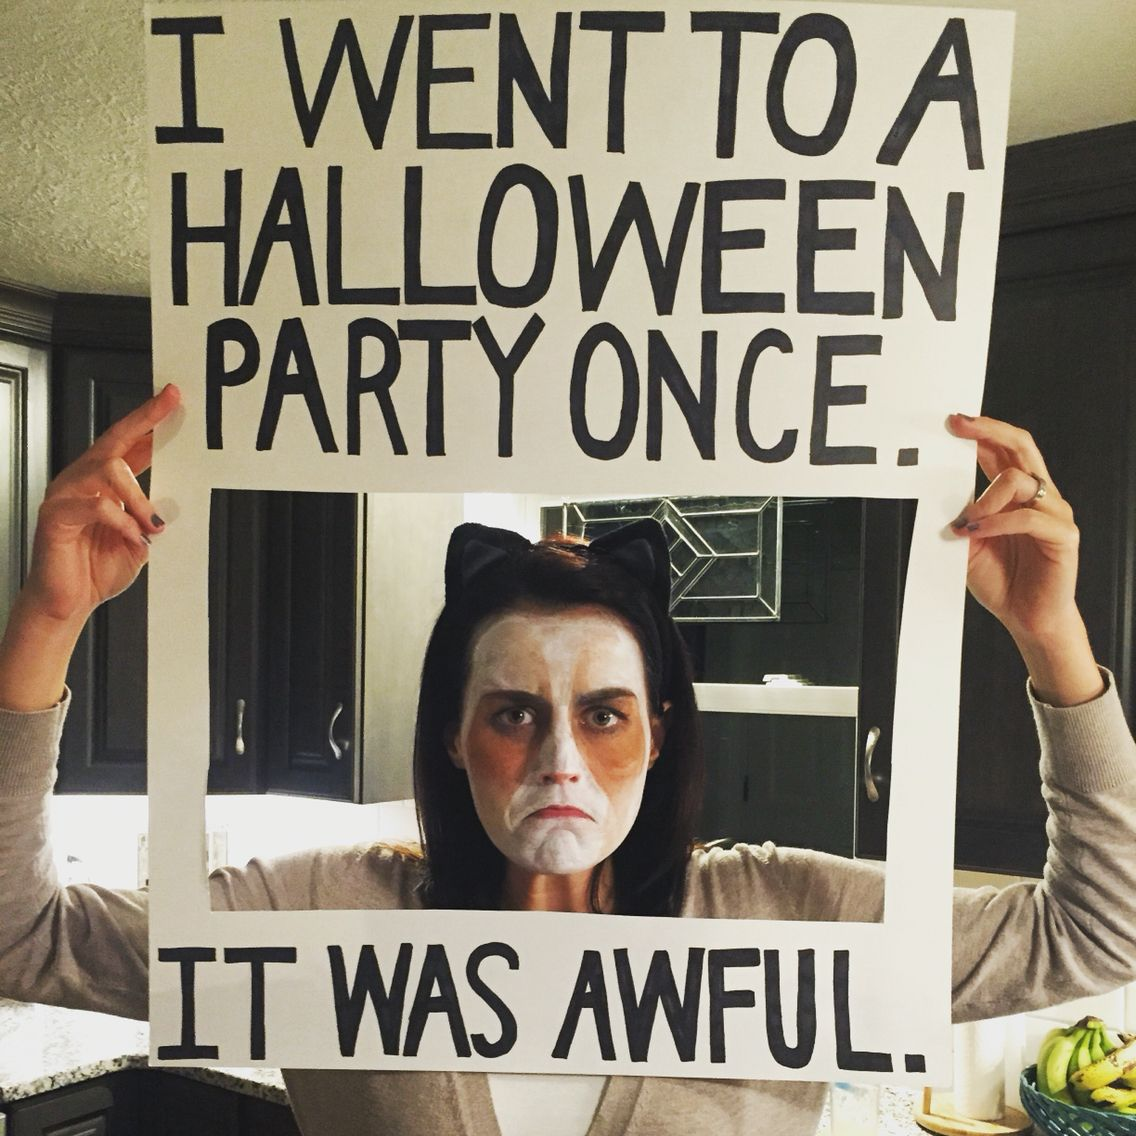 Grumpy Cat Halloween Costume. DIY. Last minute costume